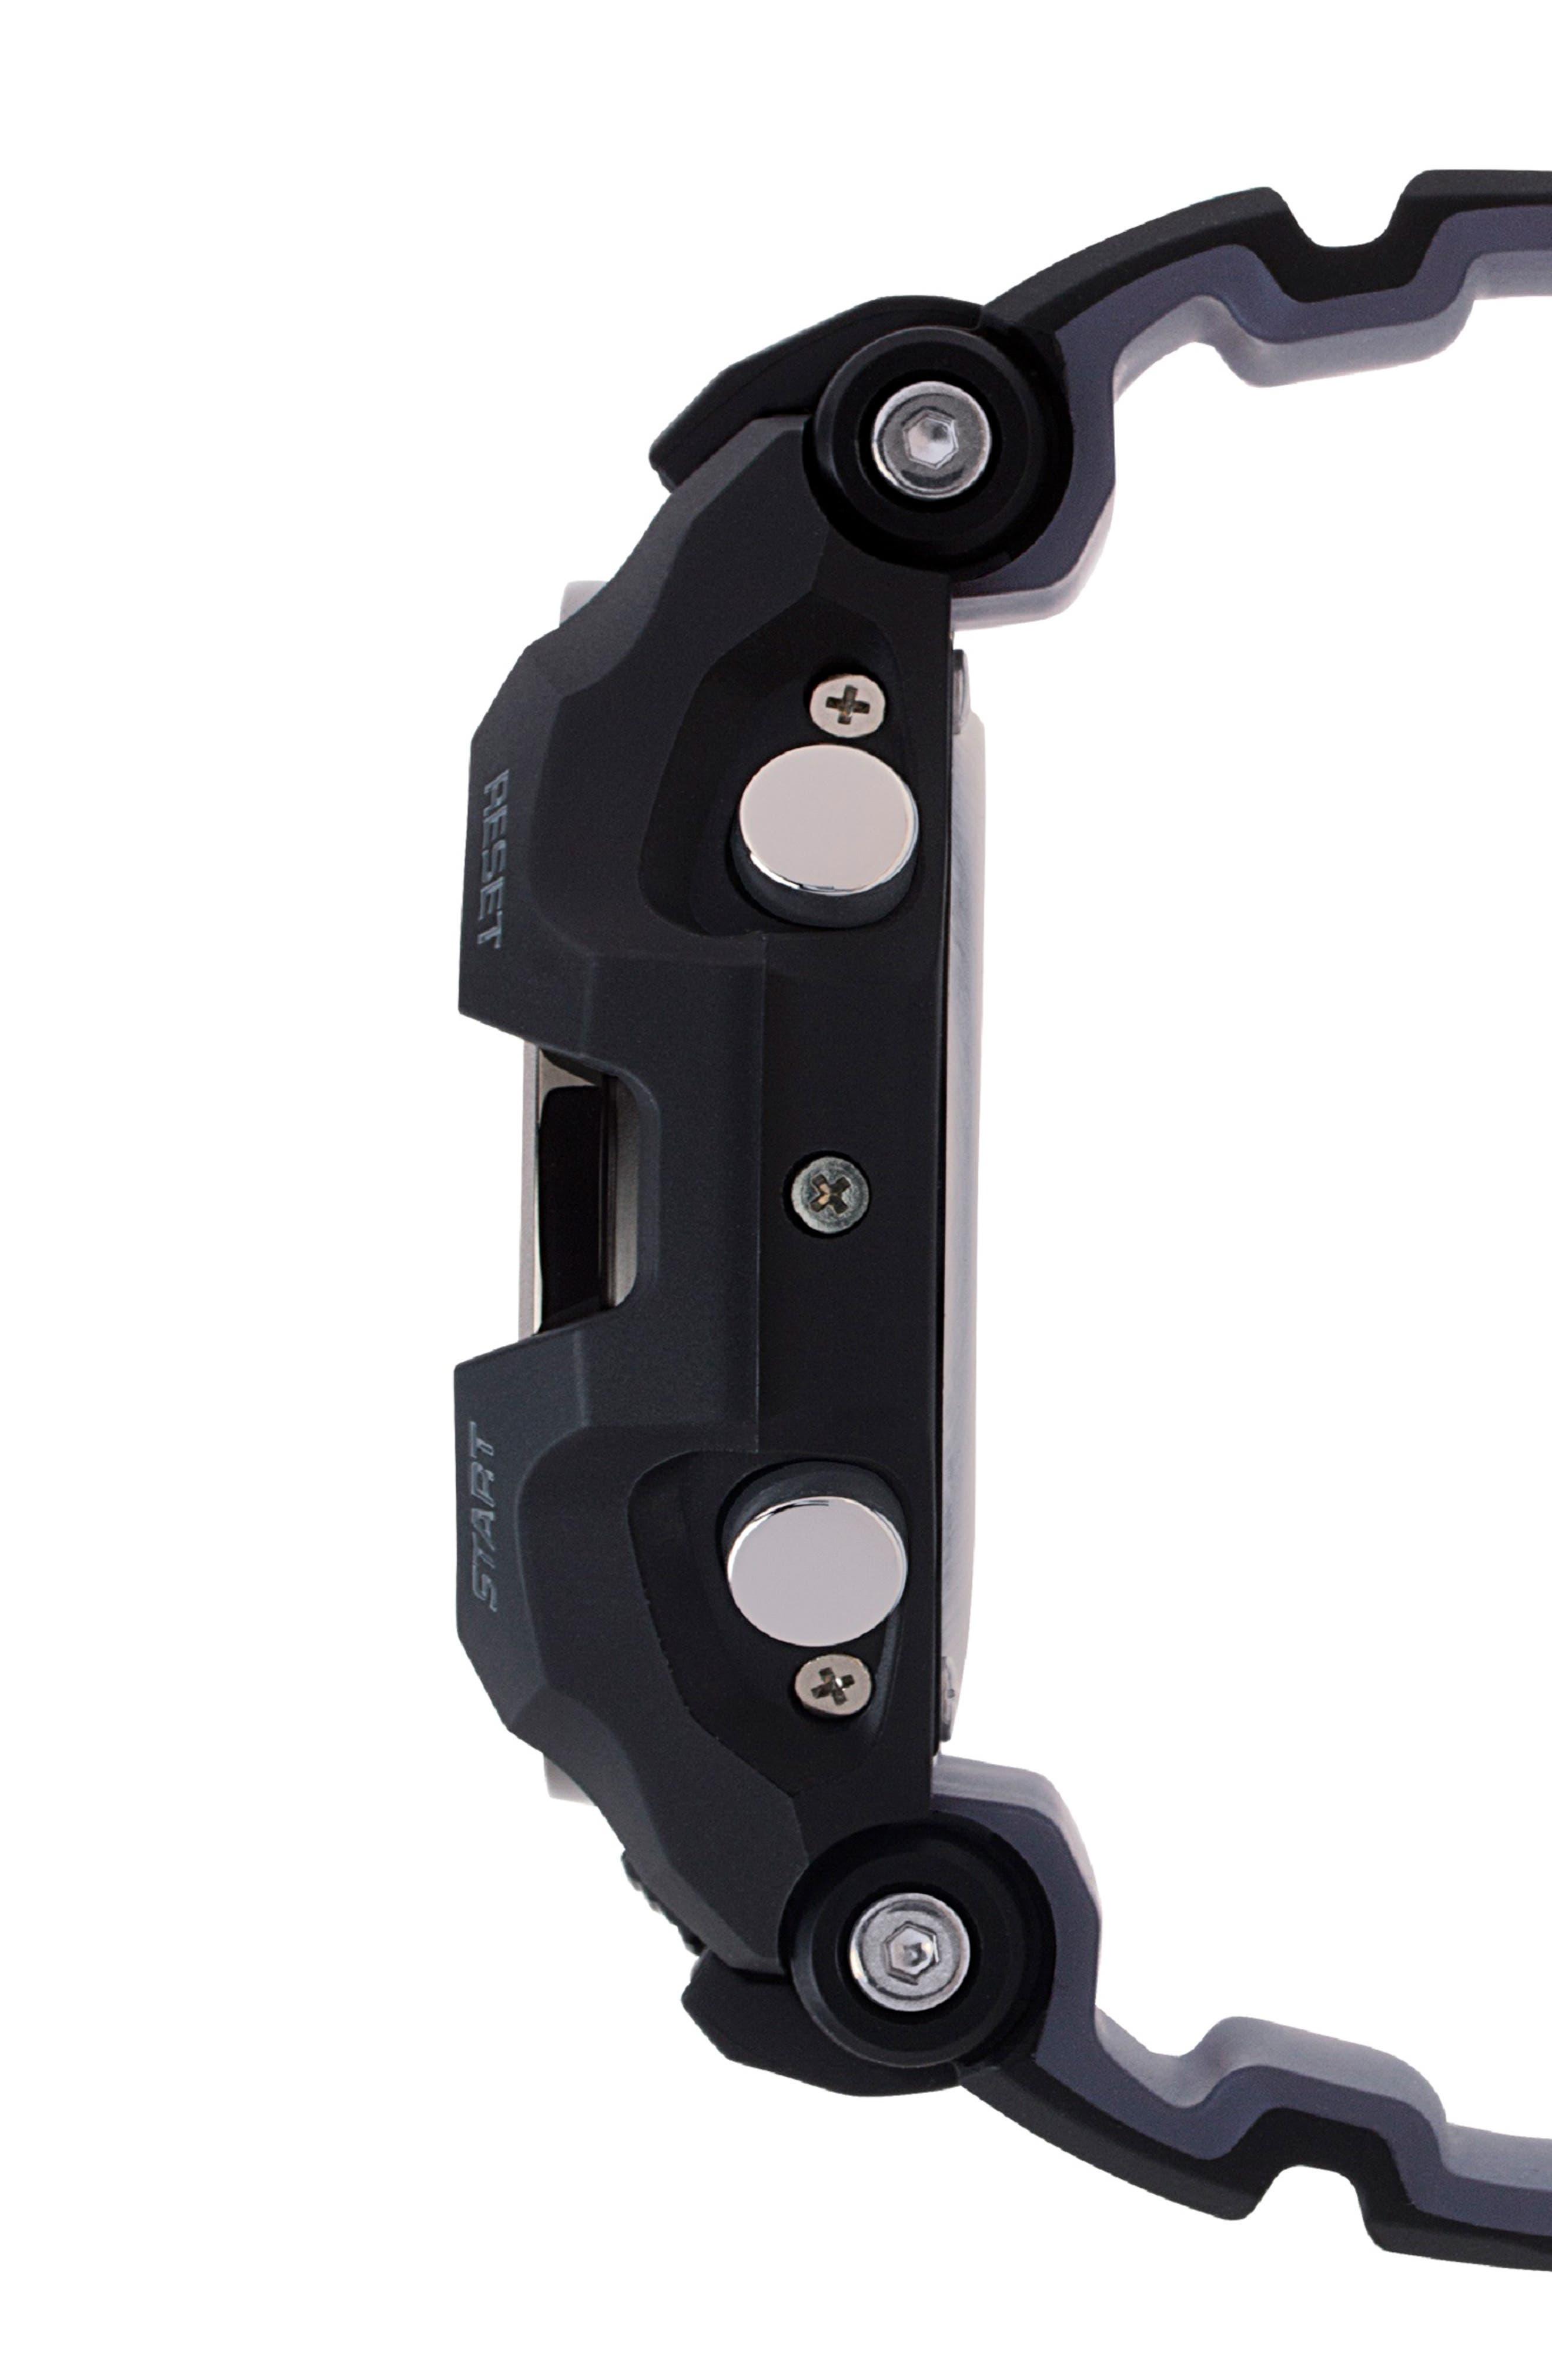 G-SHOCK BABY-G, G-Shock GravityMaster Ana-Digi Bluetooth<sup>®</sup> Enabled Resin Strap Watch, 49mm, Alternate thumbnail 3, color, BLACK MULTI